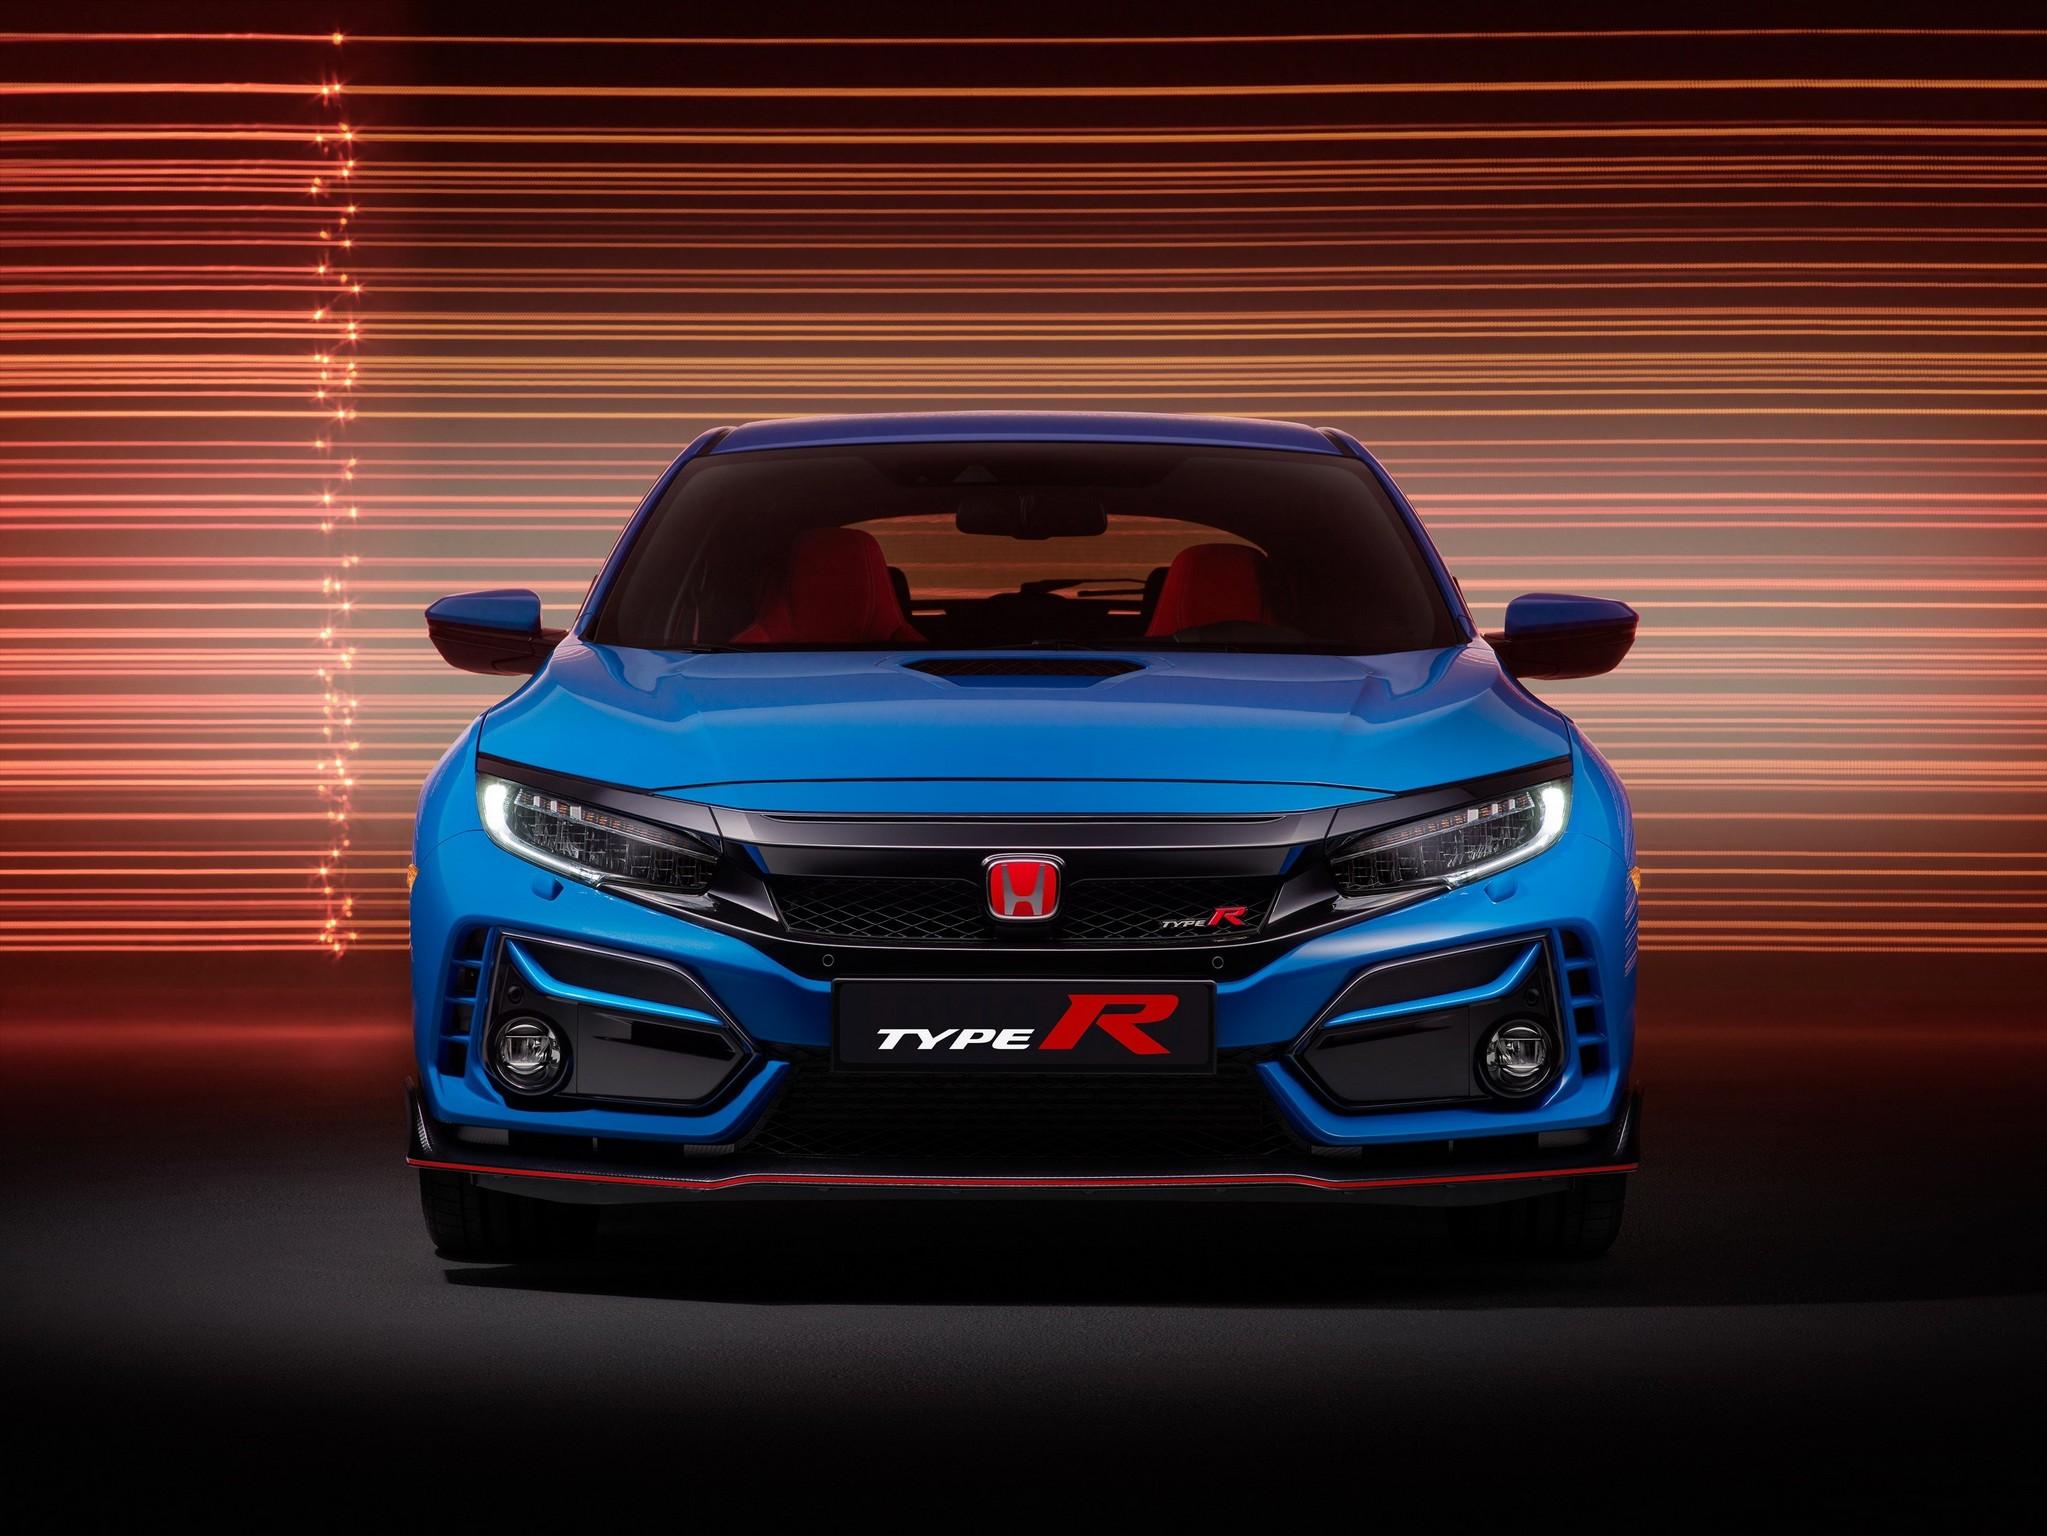 2020 Civic Type R GT